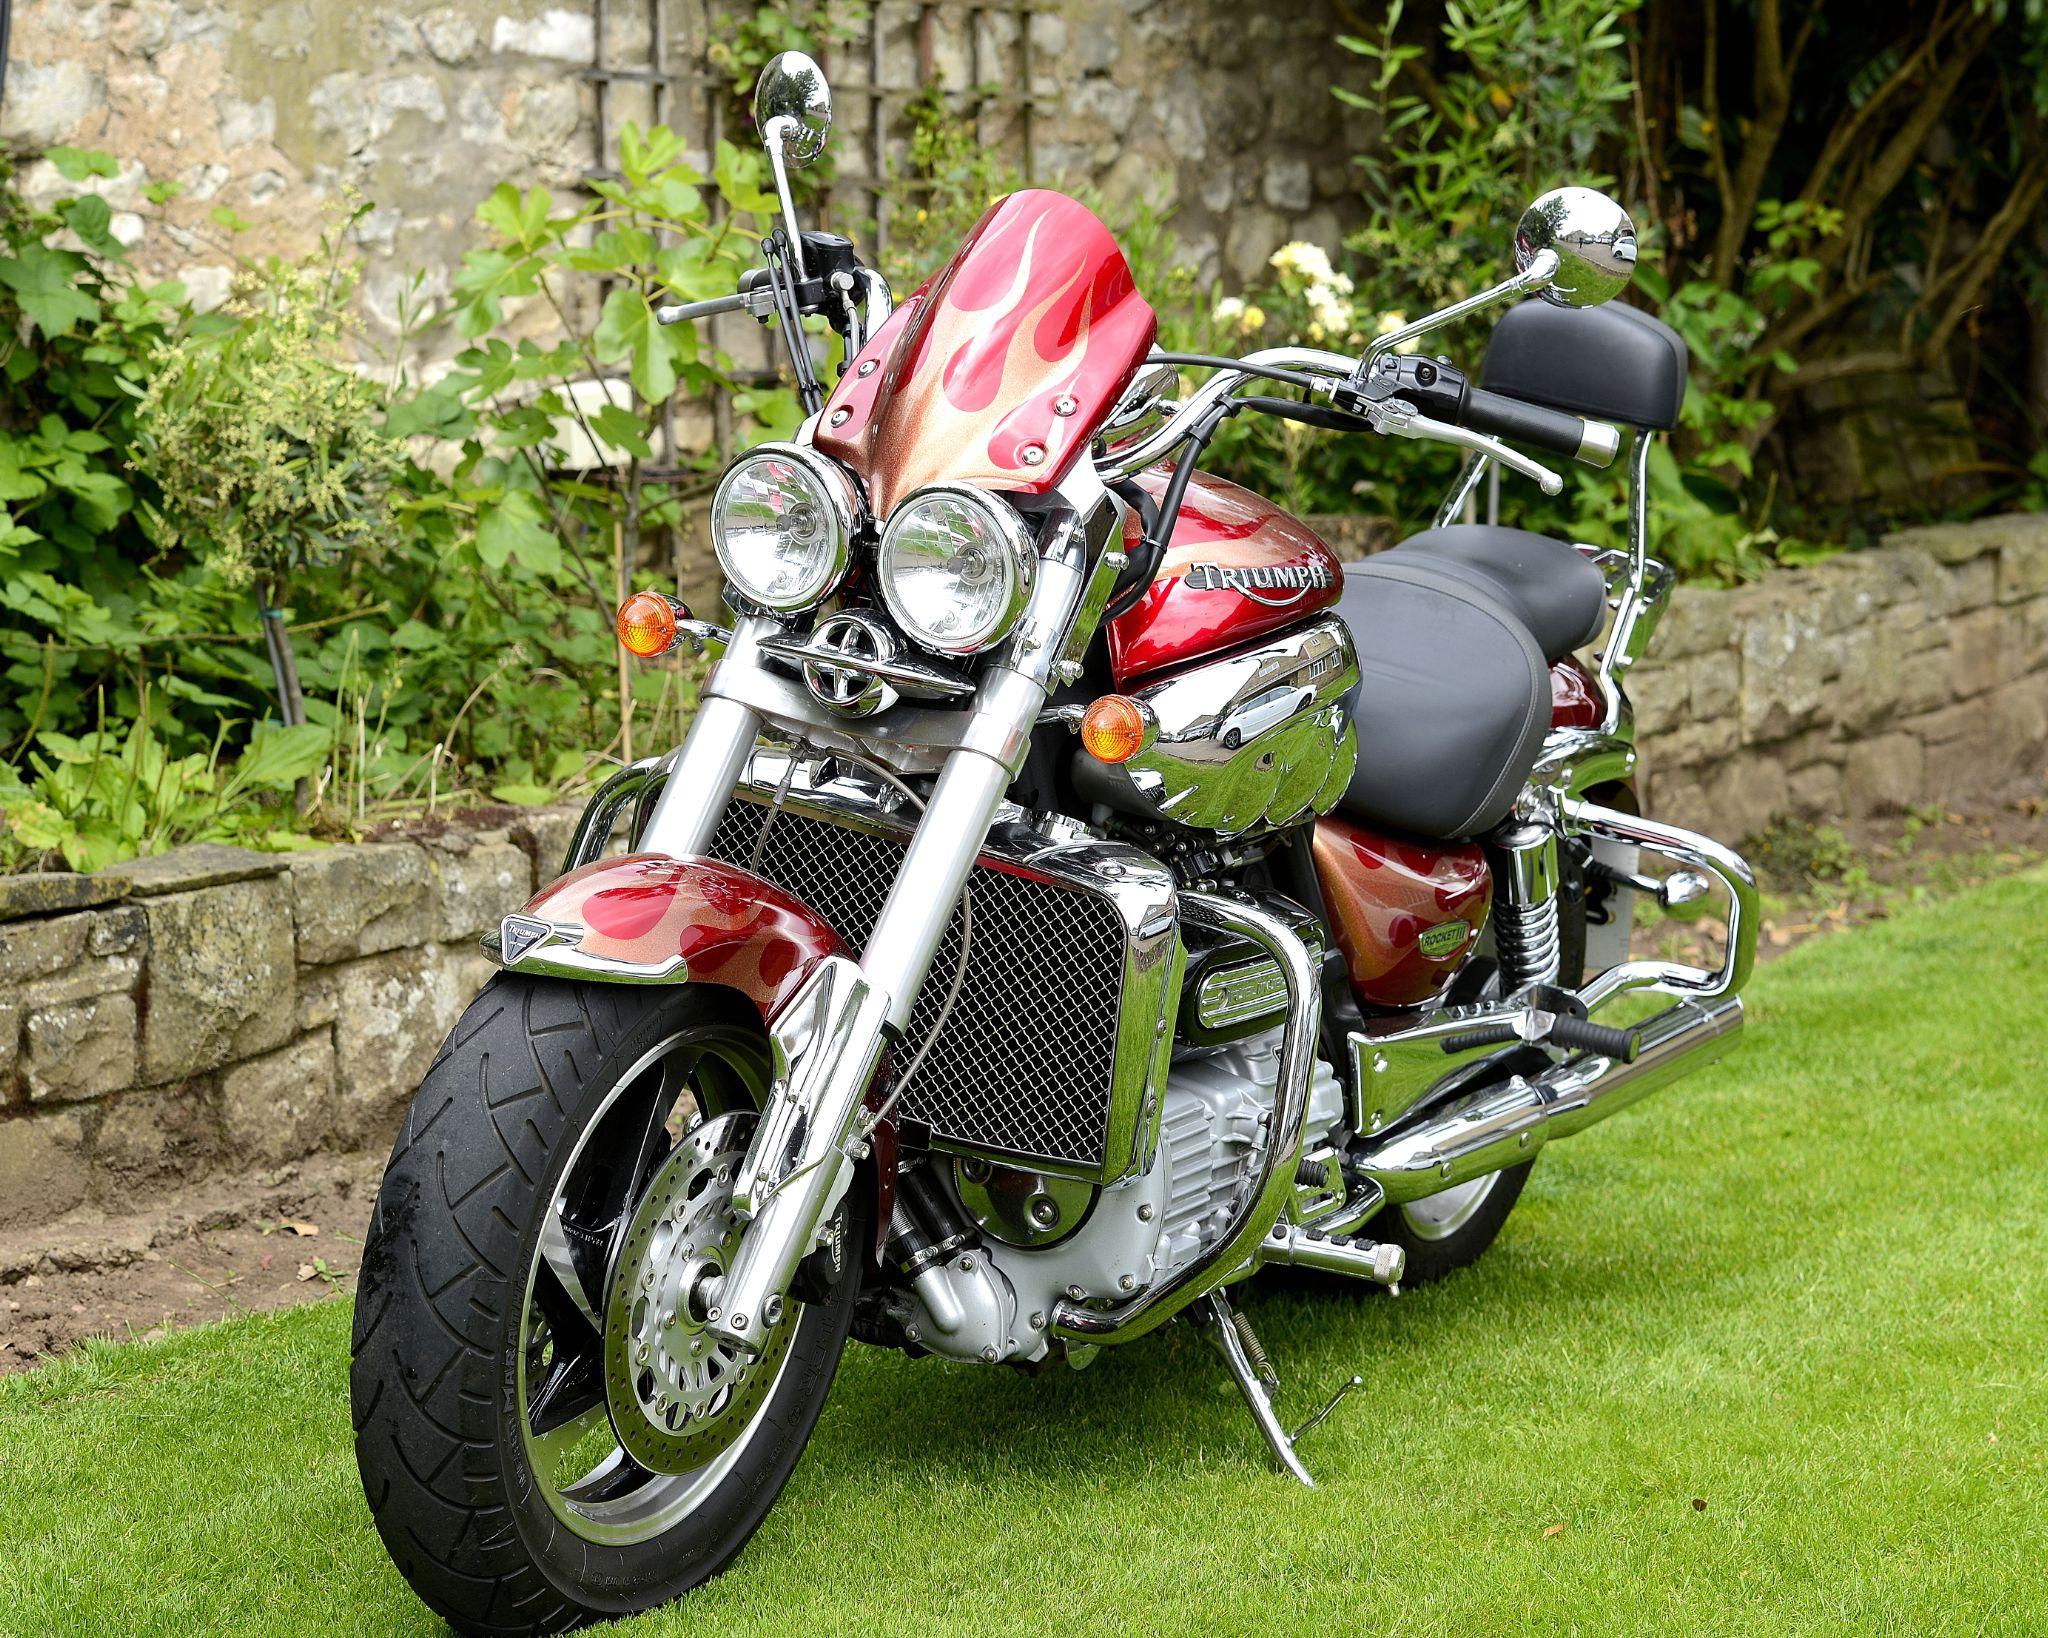 Triumph Motorbike by goodadvice.com